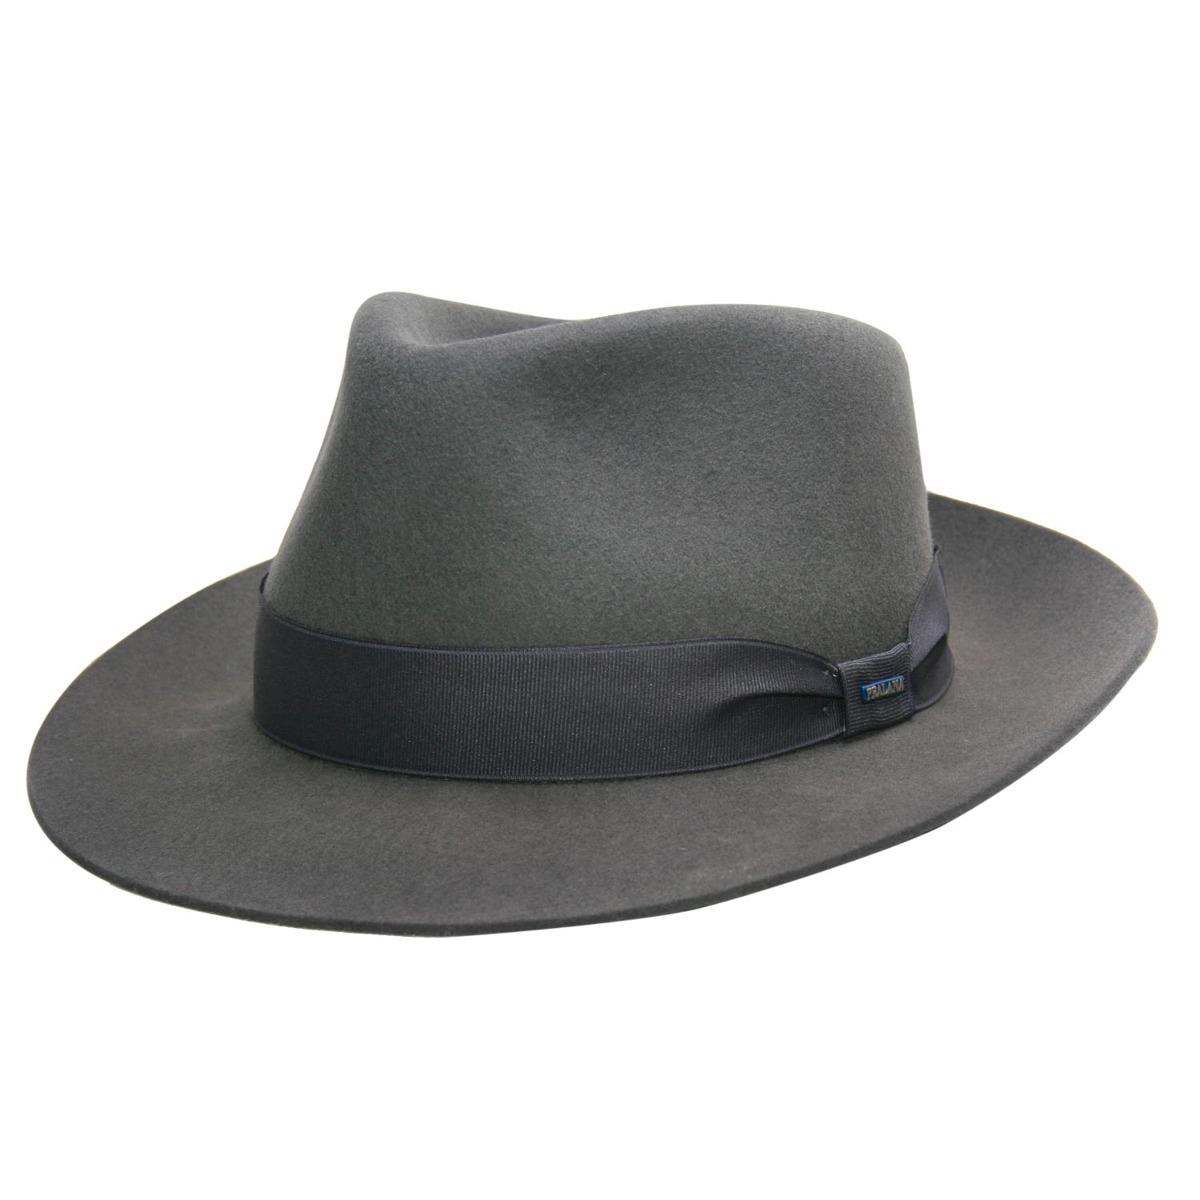 Chapéu Masculino Gangster Pralana Social Alpaca Cinza - Aba - R  169 ... 5b866a4cb9d